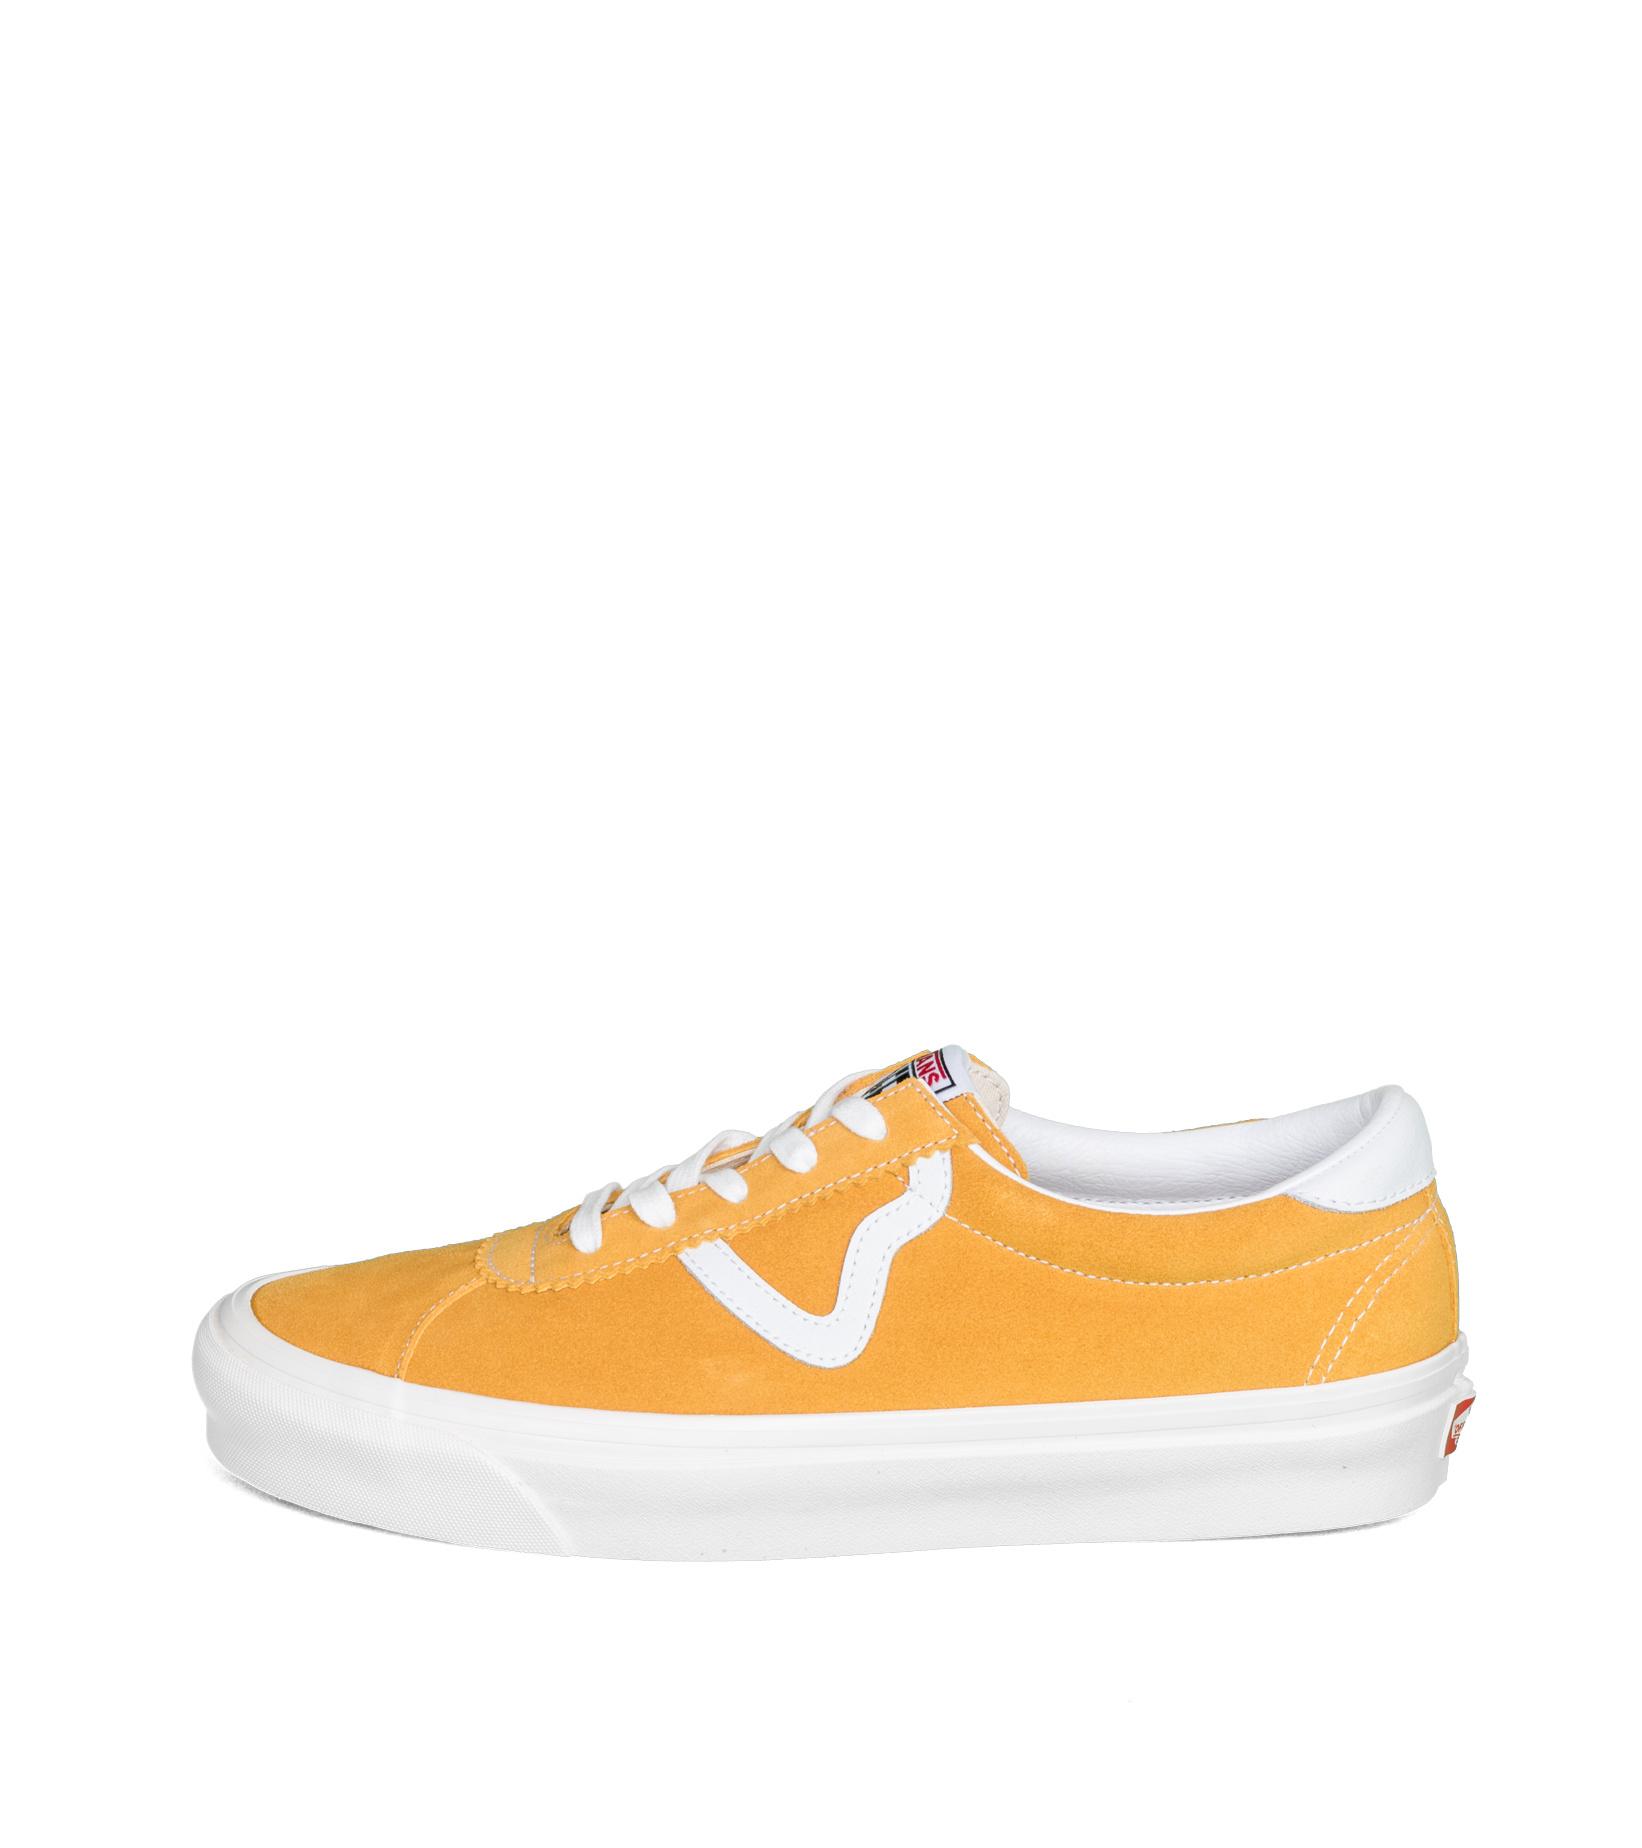 "Style 73 DX (Anaheim Factory) ""OG Saffron""-3"